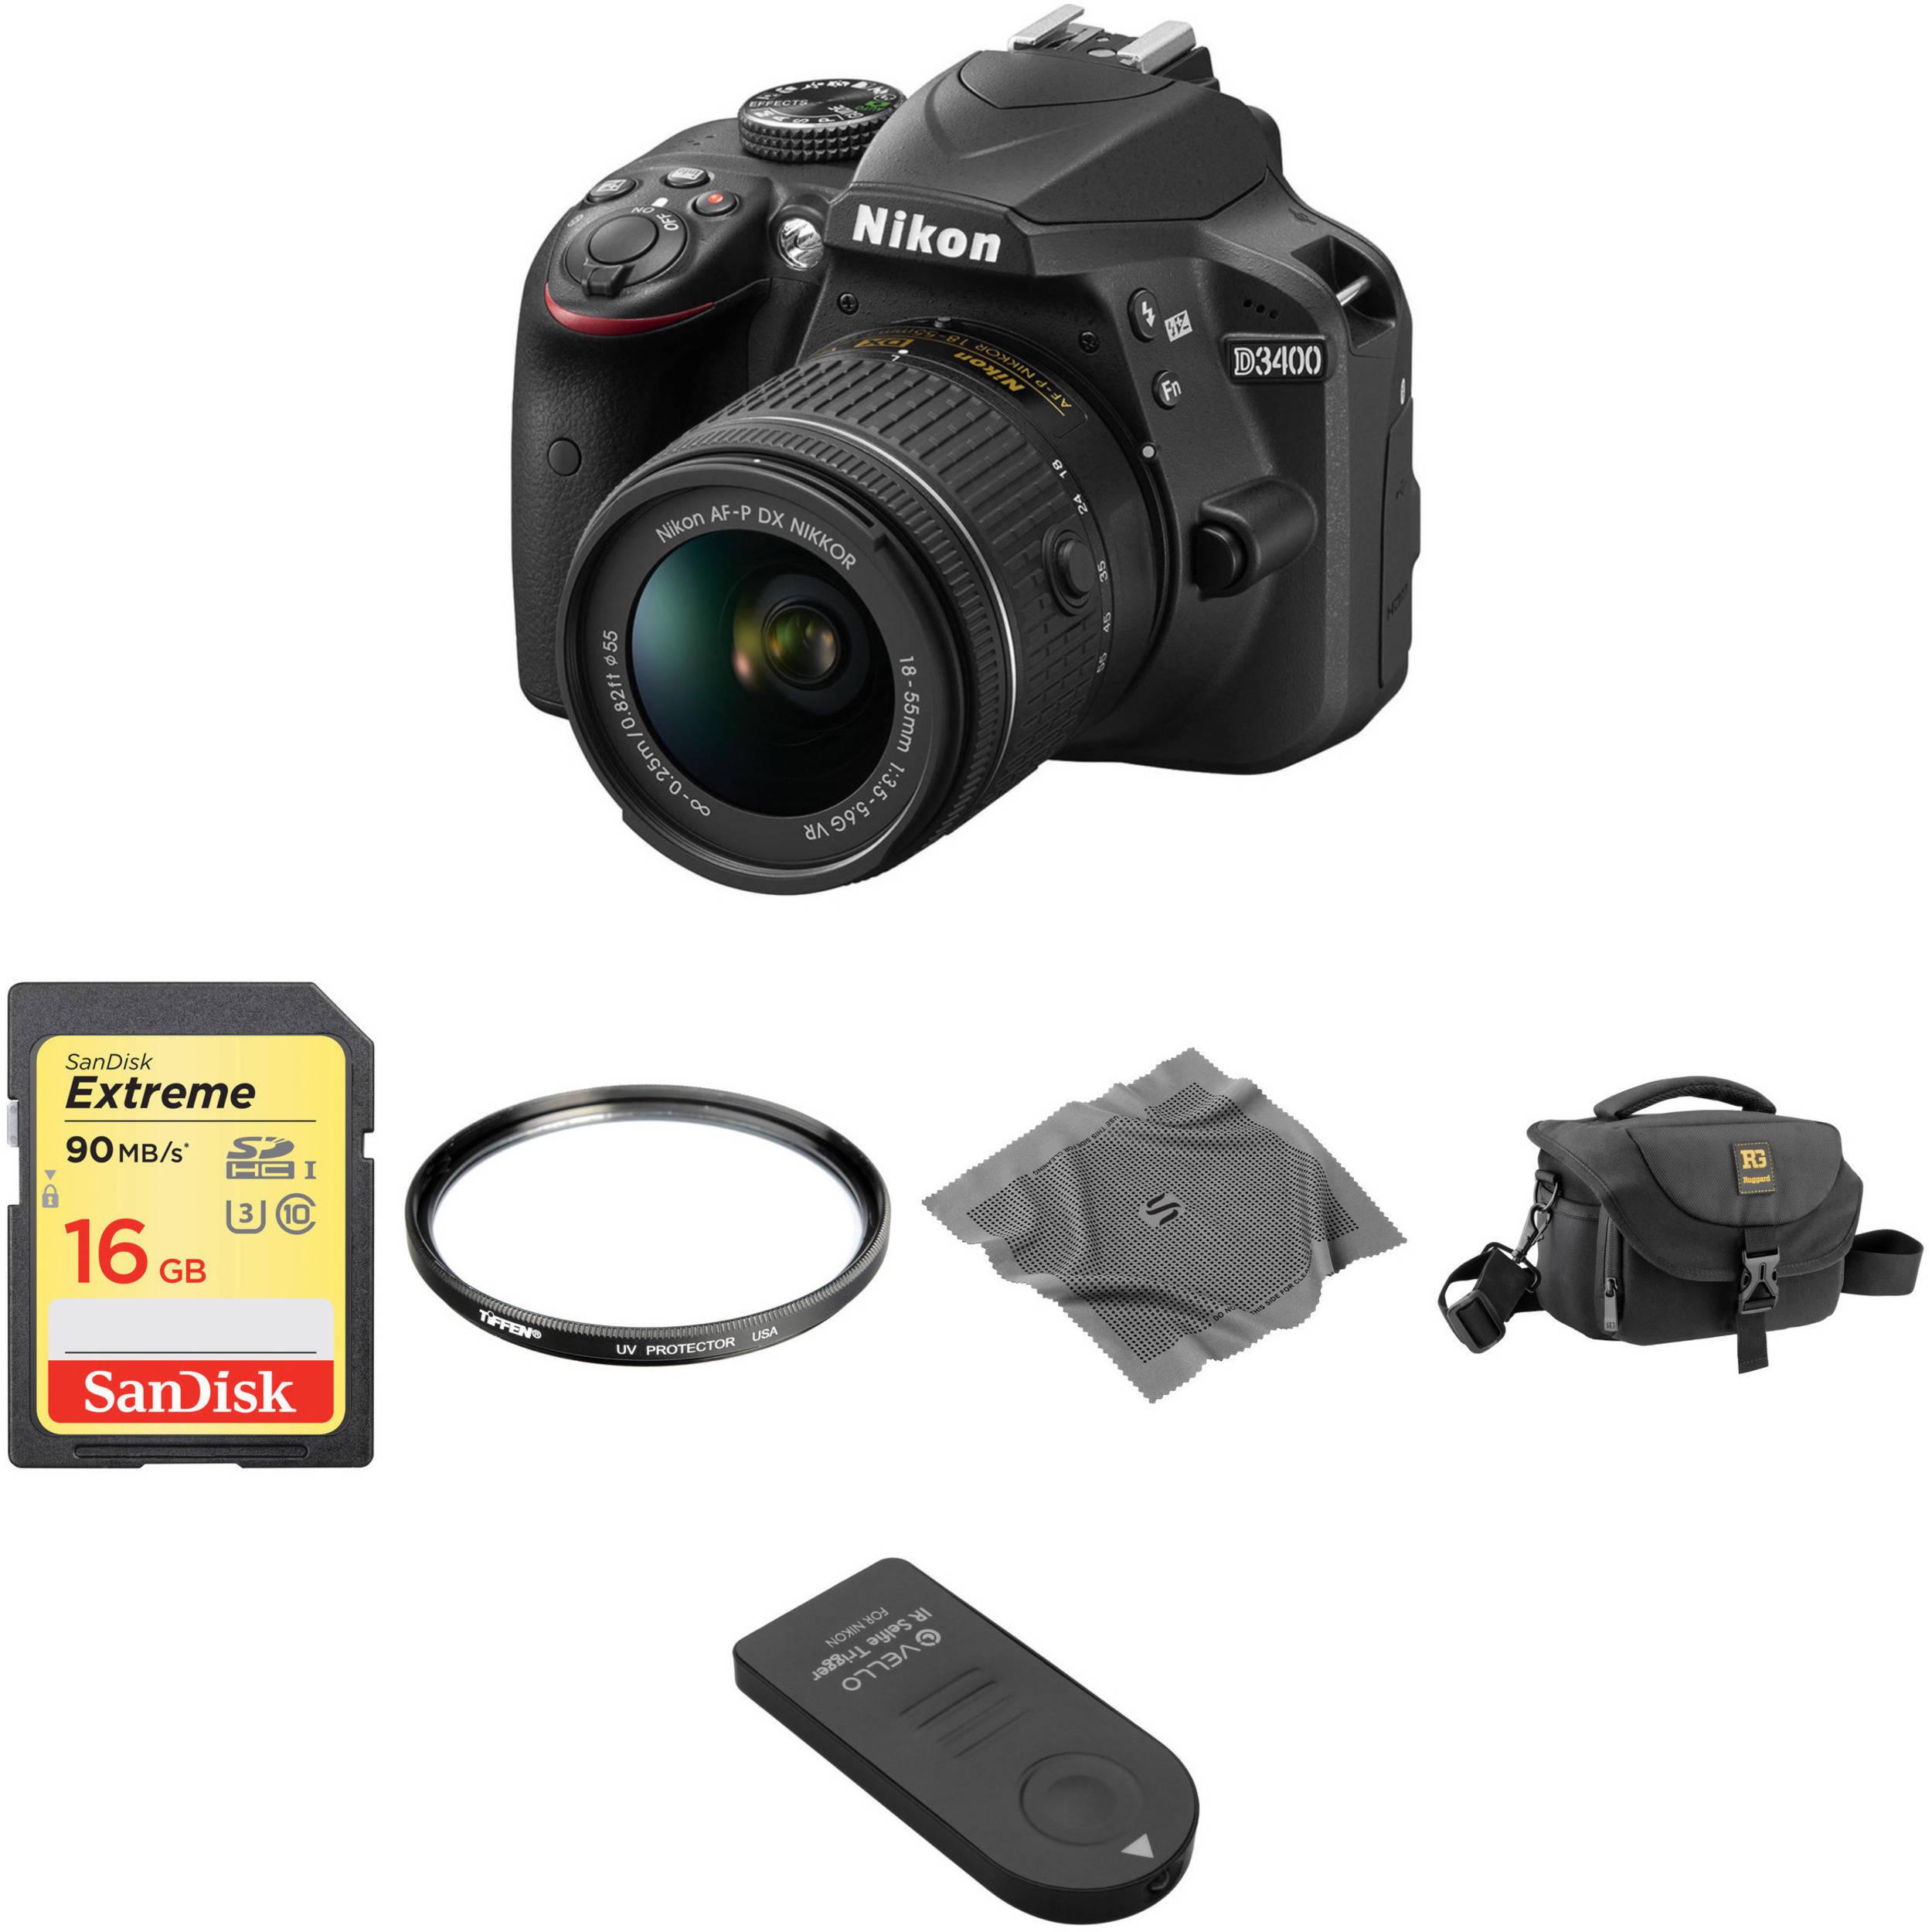 Nikon Cameras | DSLR Cameras - Nikon Digital SLR Cameras | B&H